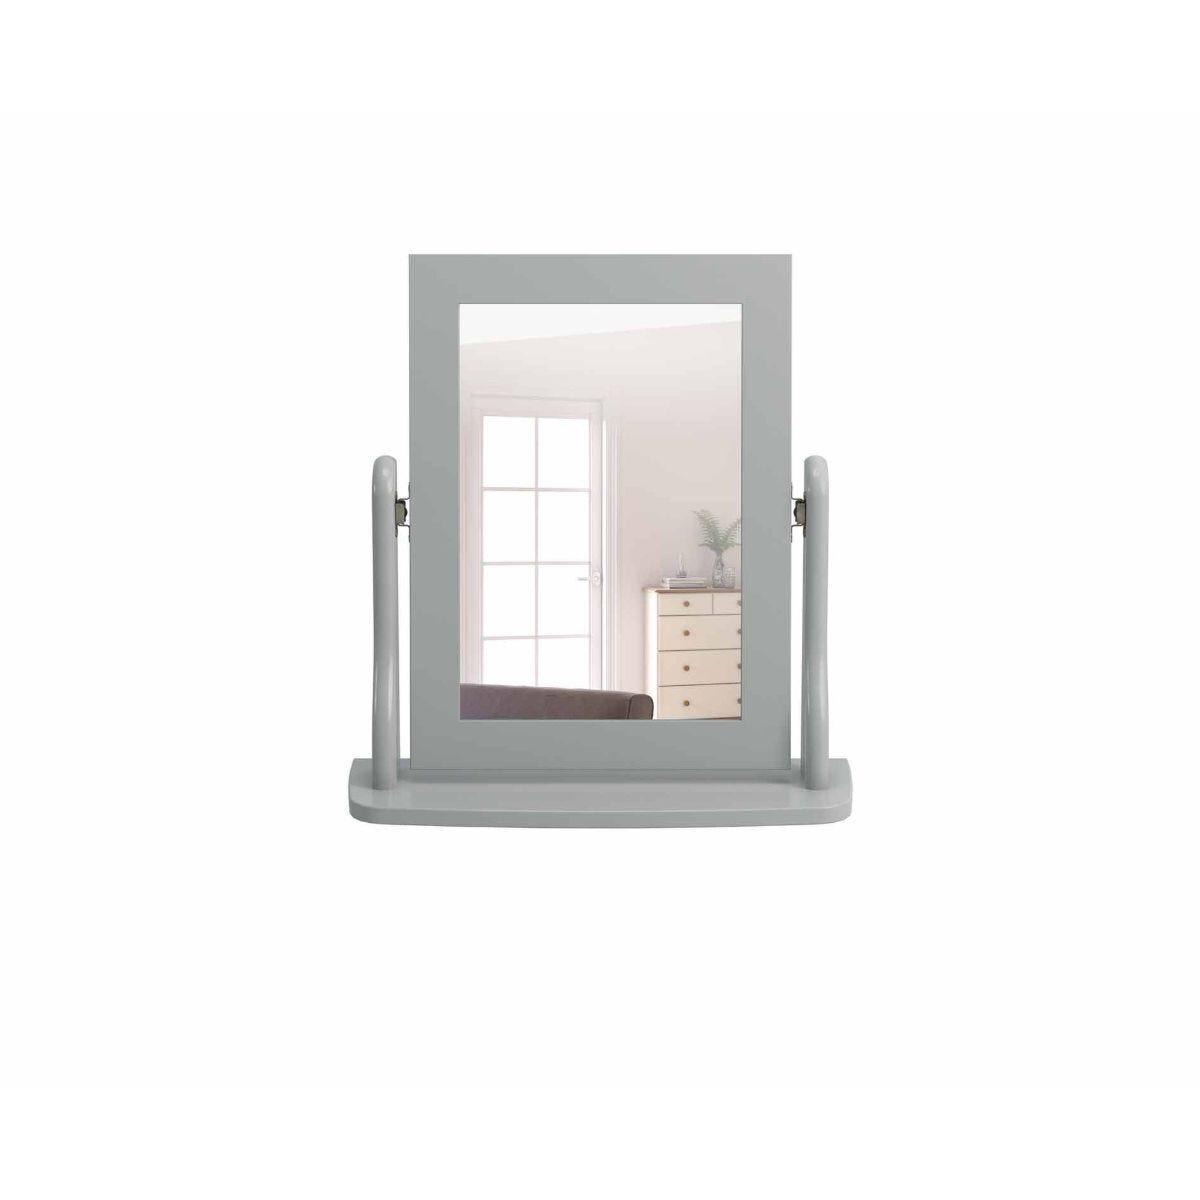 Steens Baroque Adjustable Dresser Mirror Grey